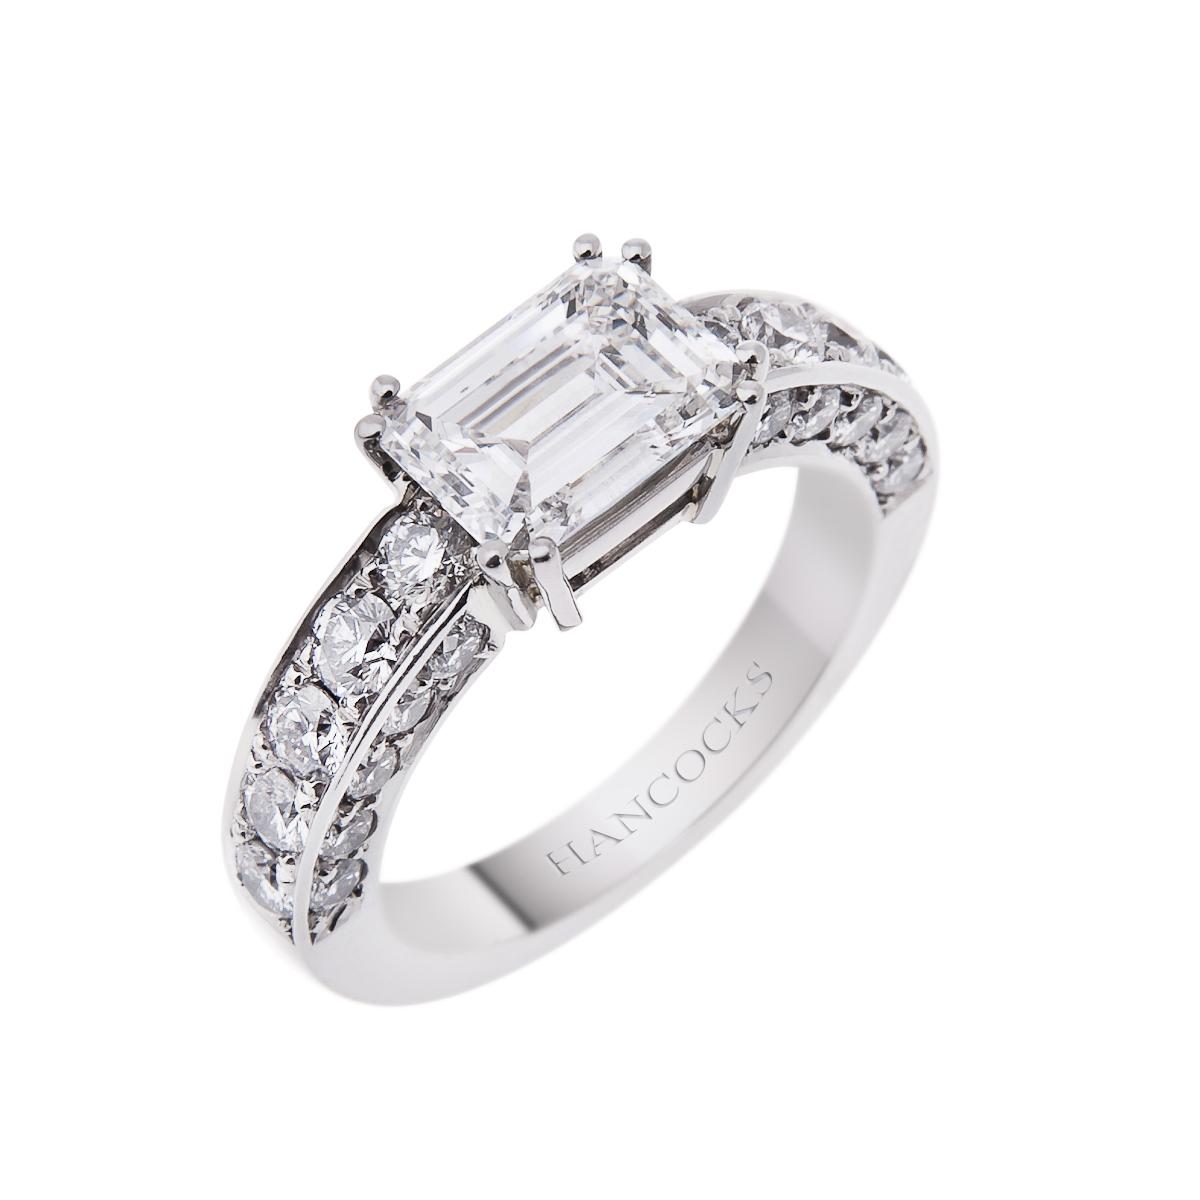 certificated emerald cut diamond dress ring